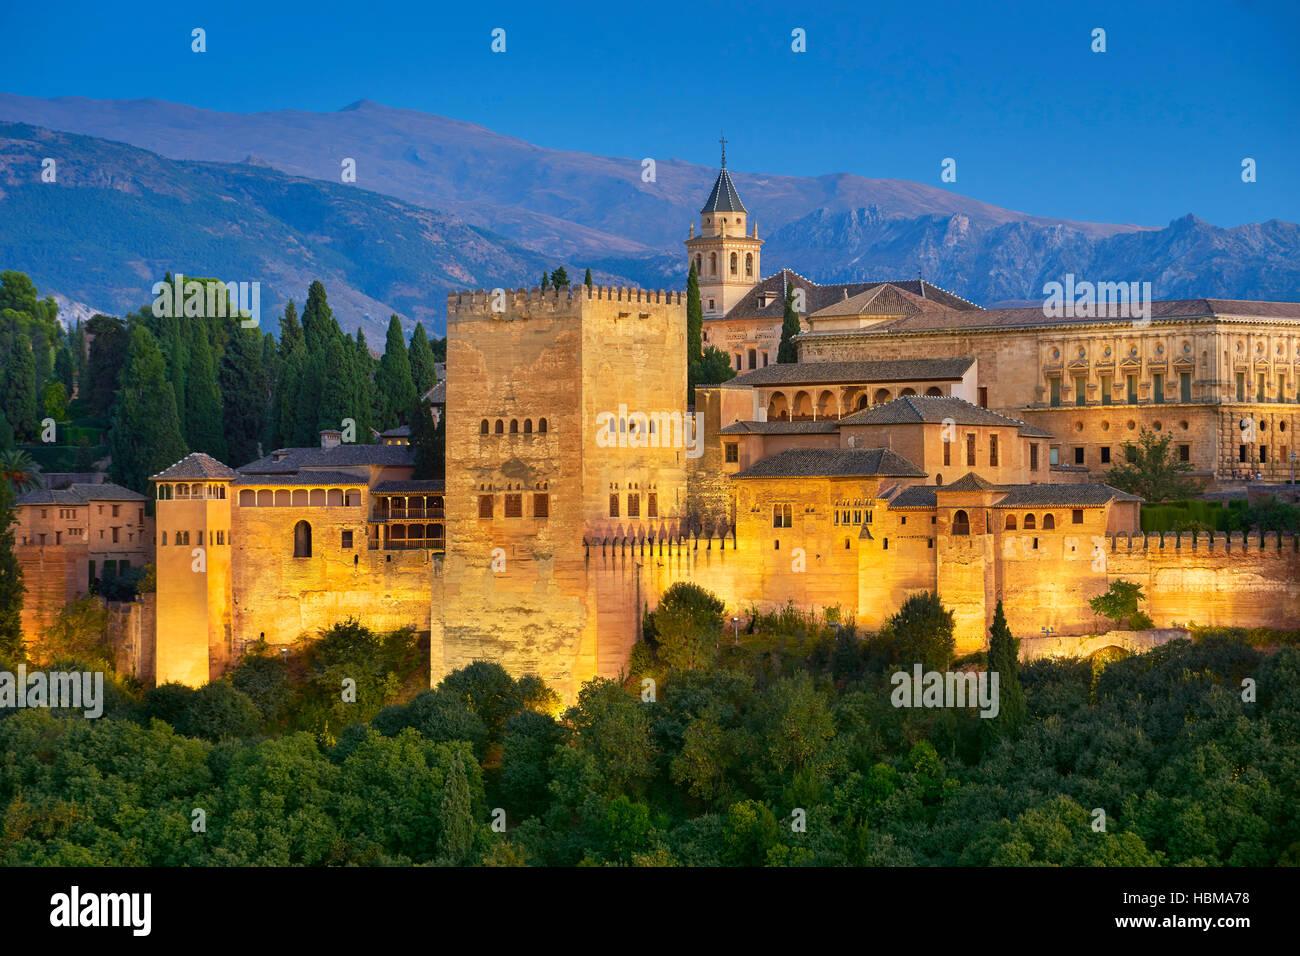 Alhambra-Palast am fasse, Granada, Andalusien, Spanien Stockbild